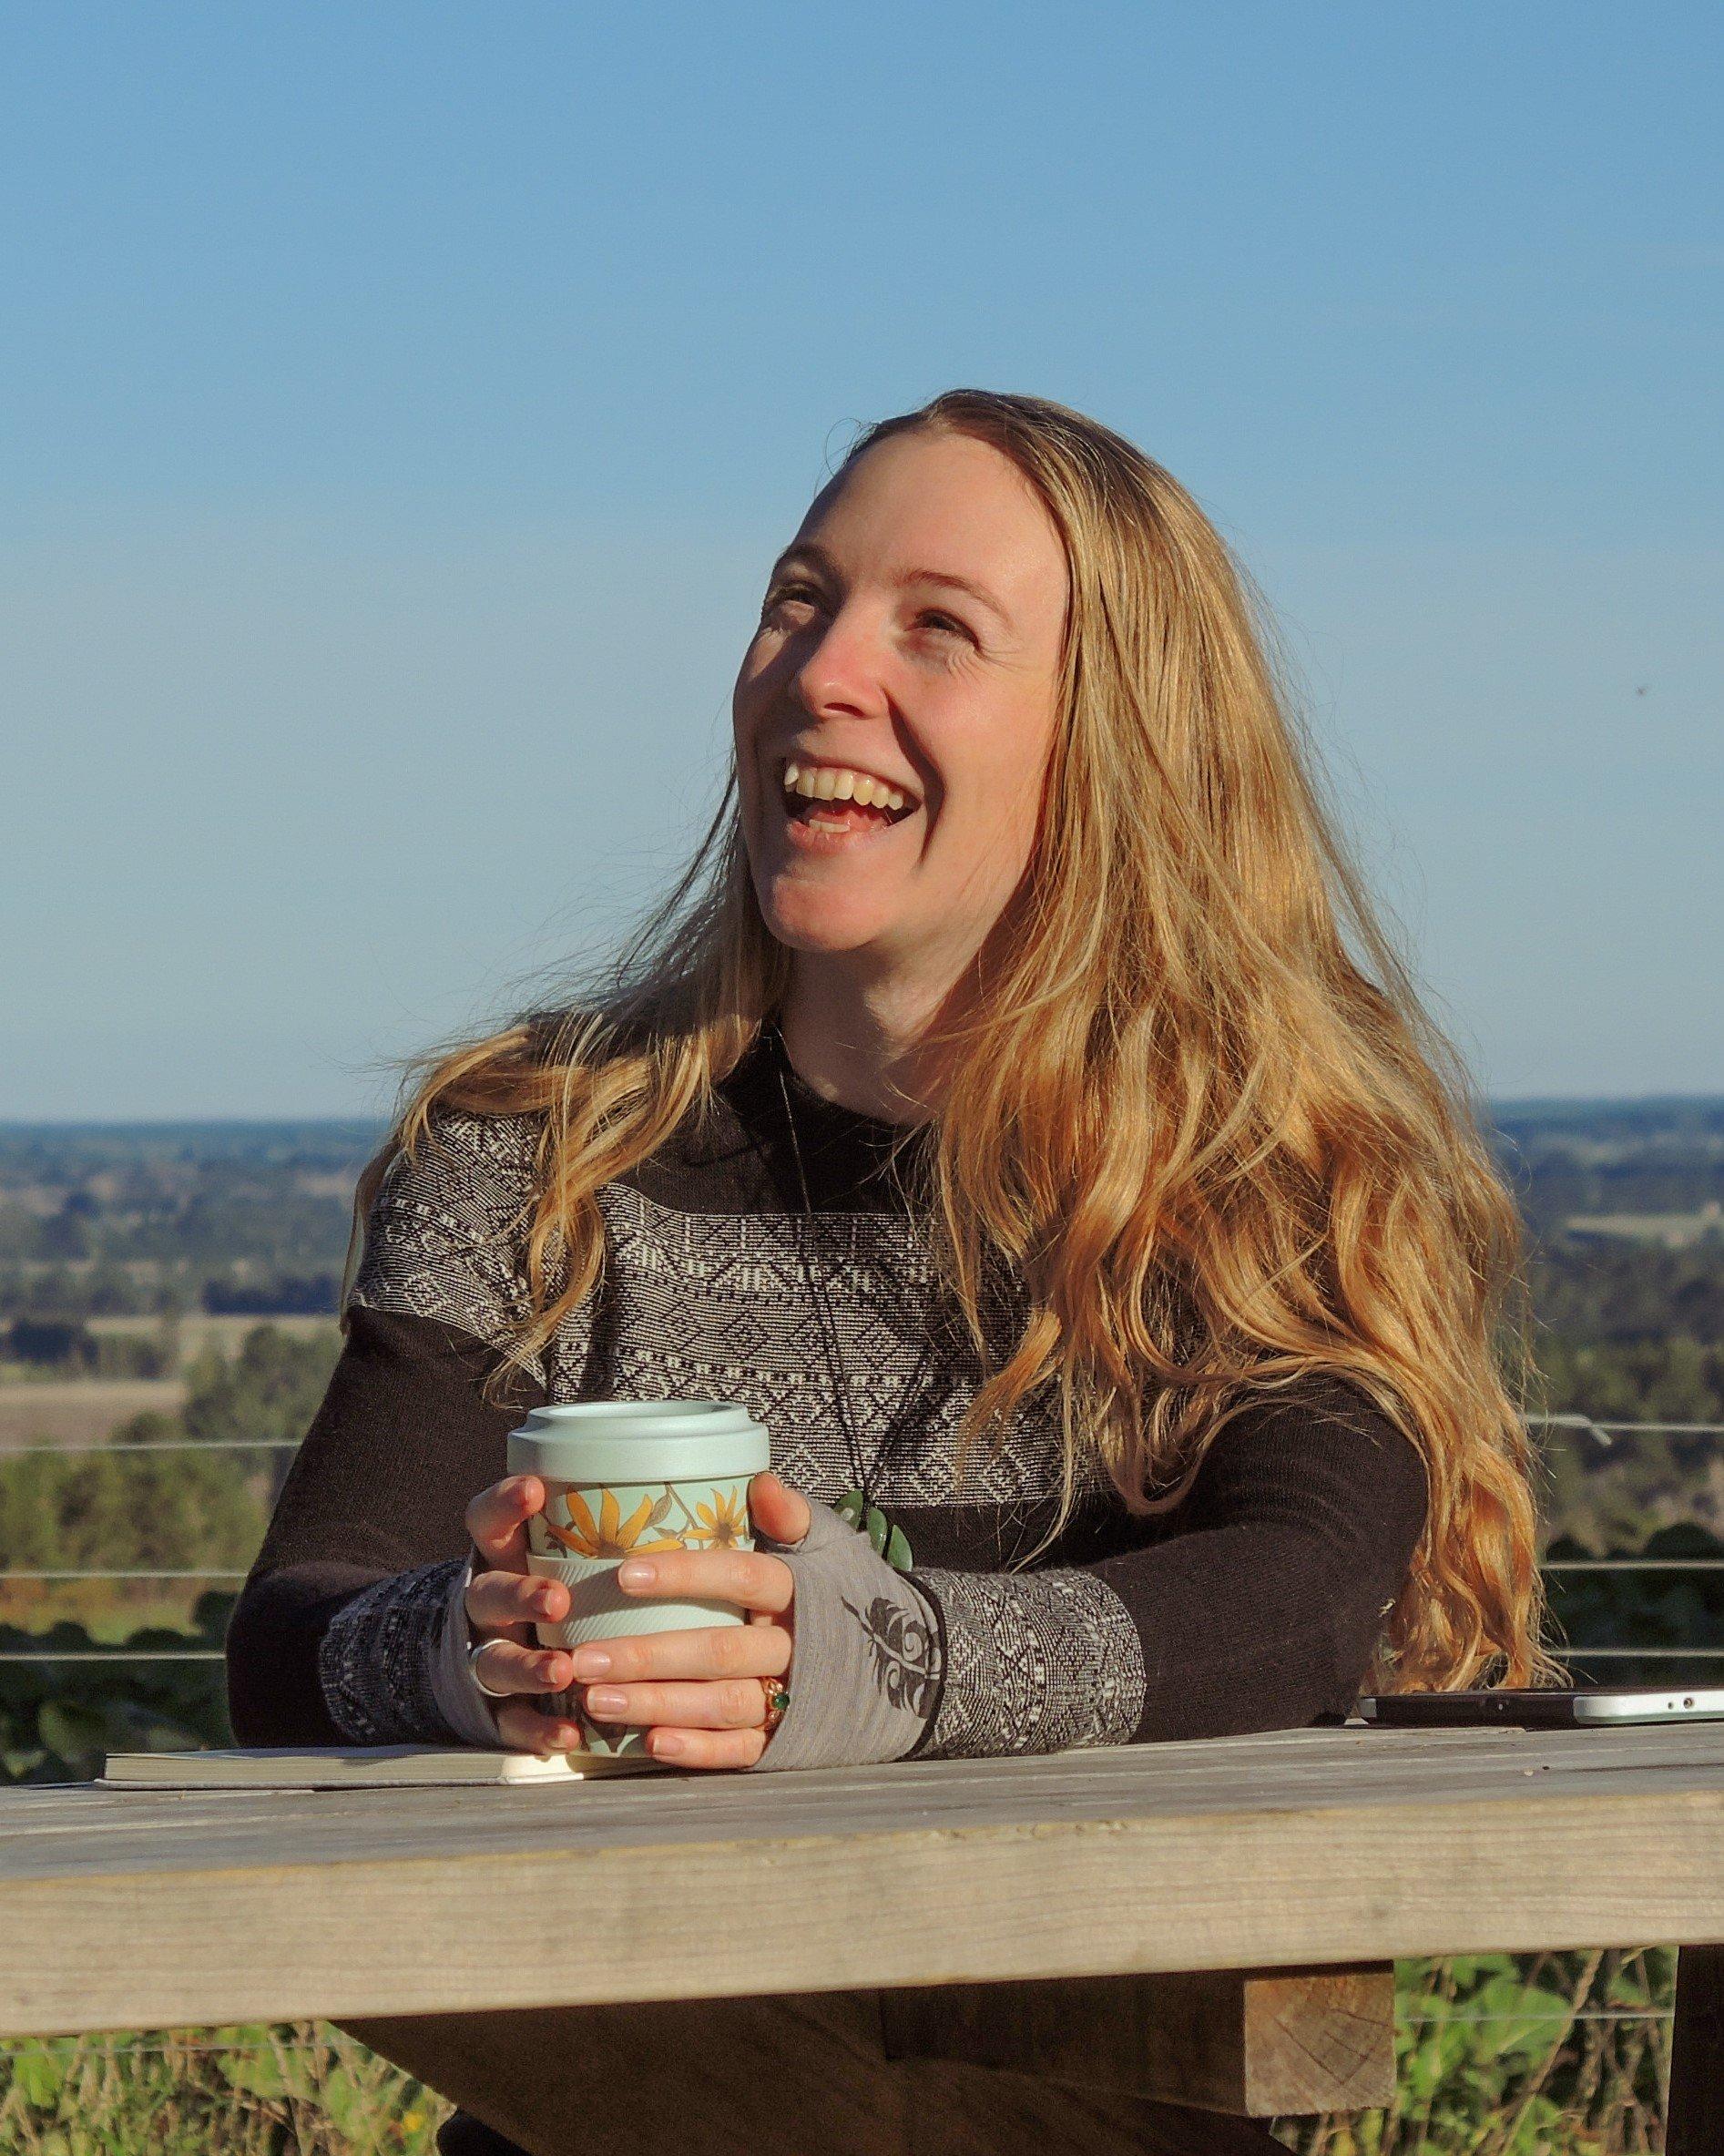 This is me - Jodie Munro, Eco-friendly Wedding Planner